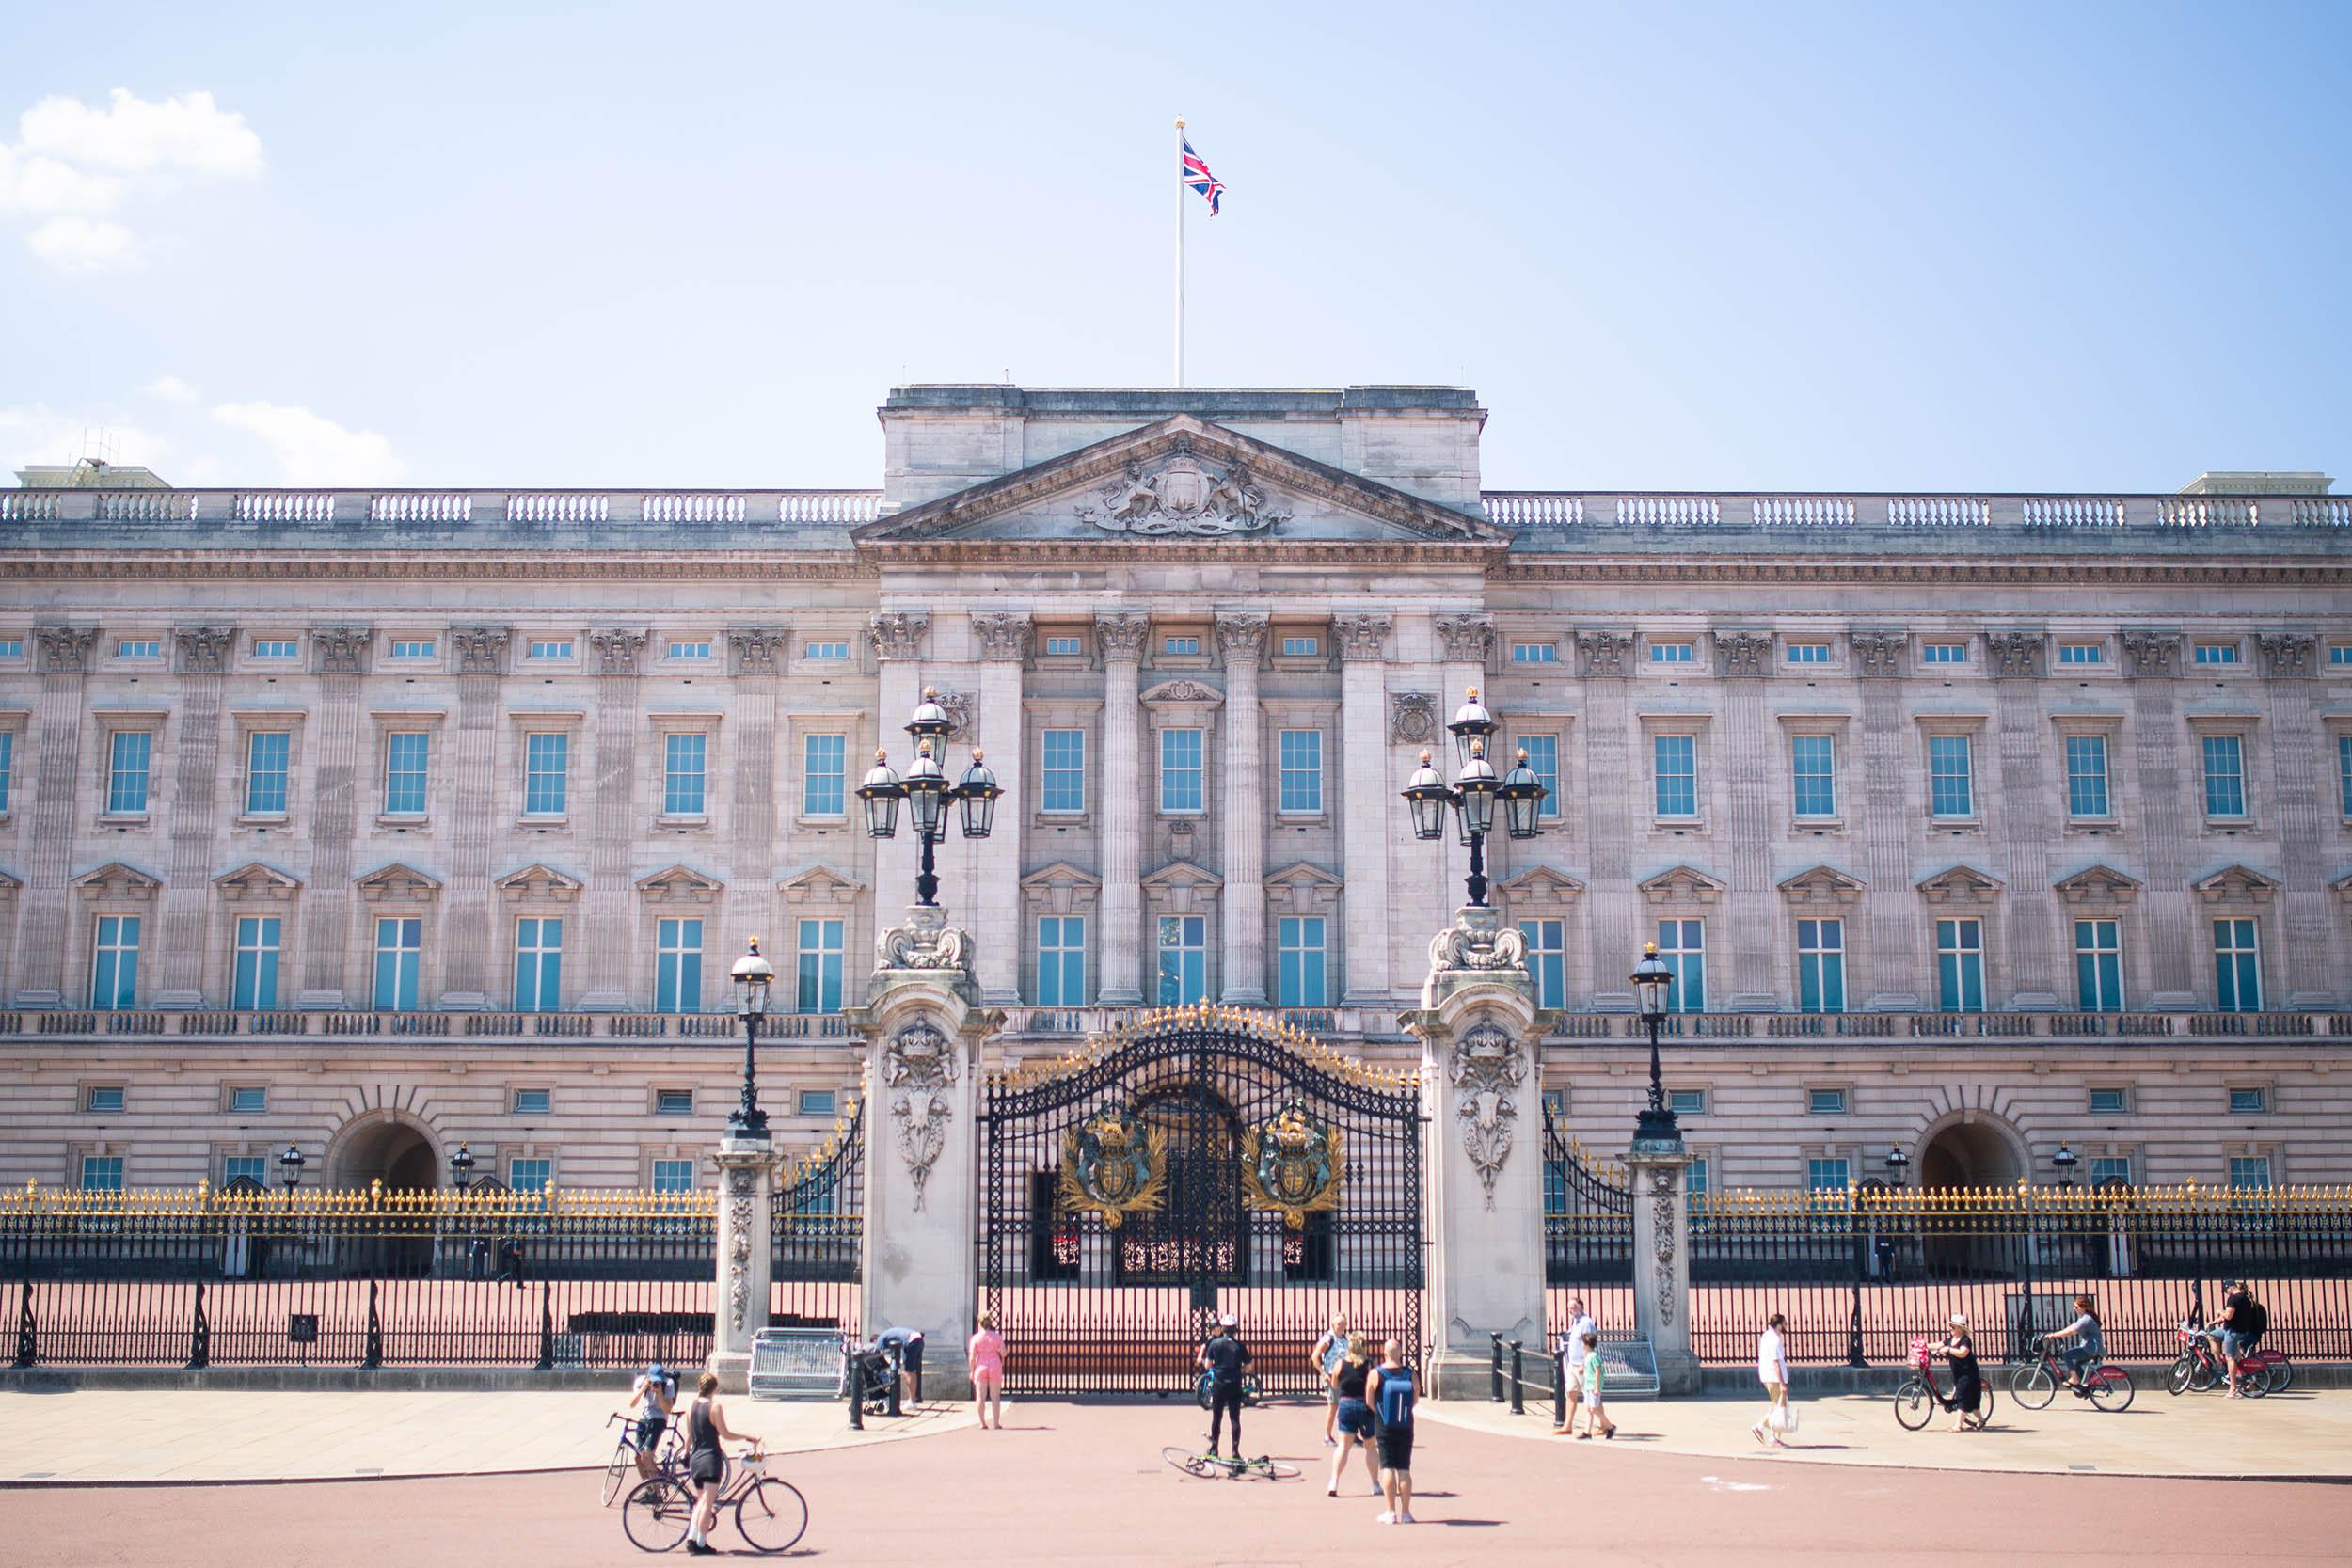 ENGLAND_LONDON_BUCKINGHAMPALACE_0003